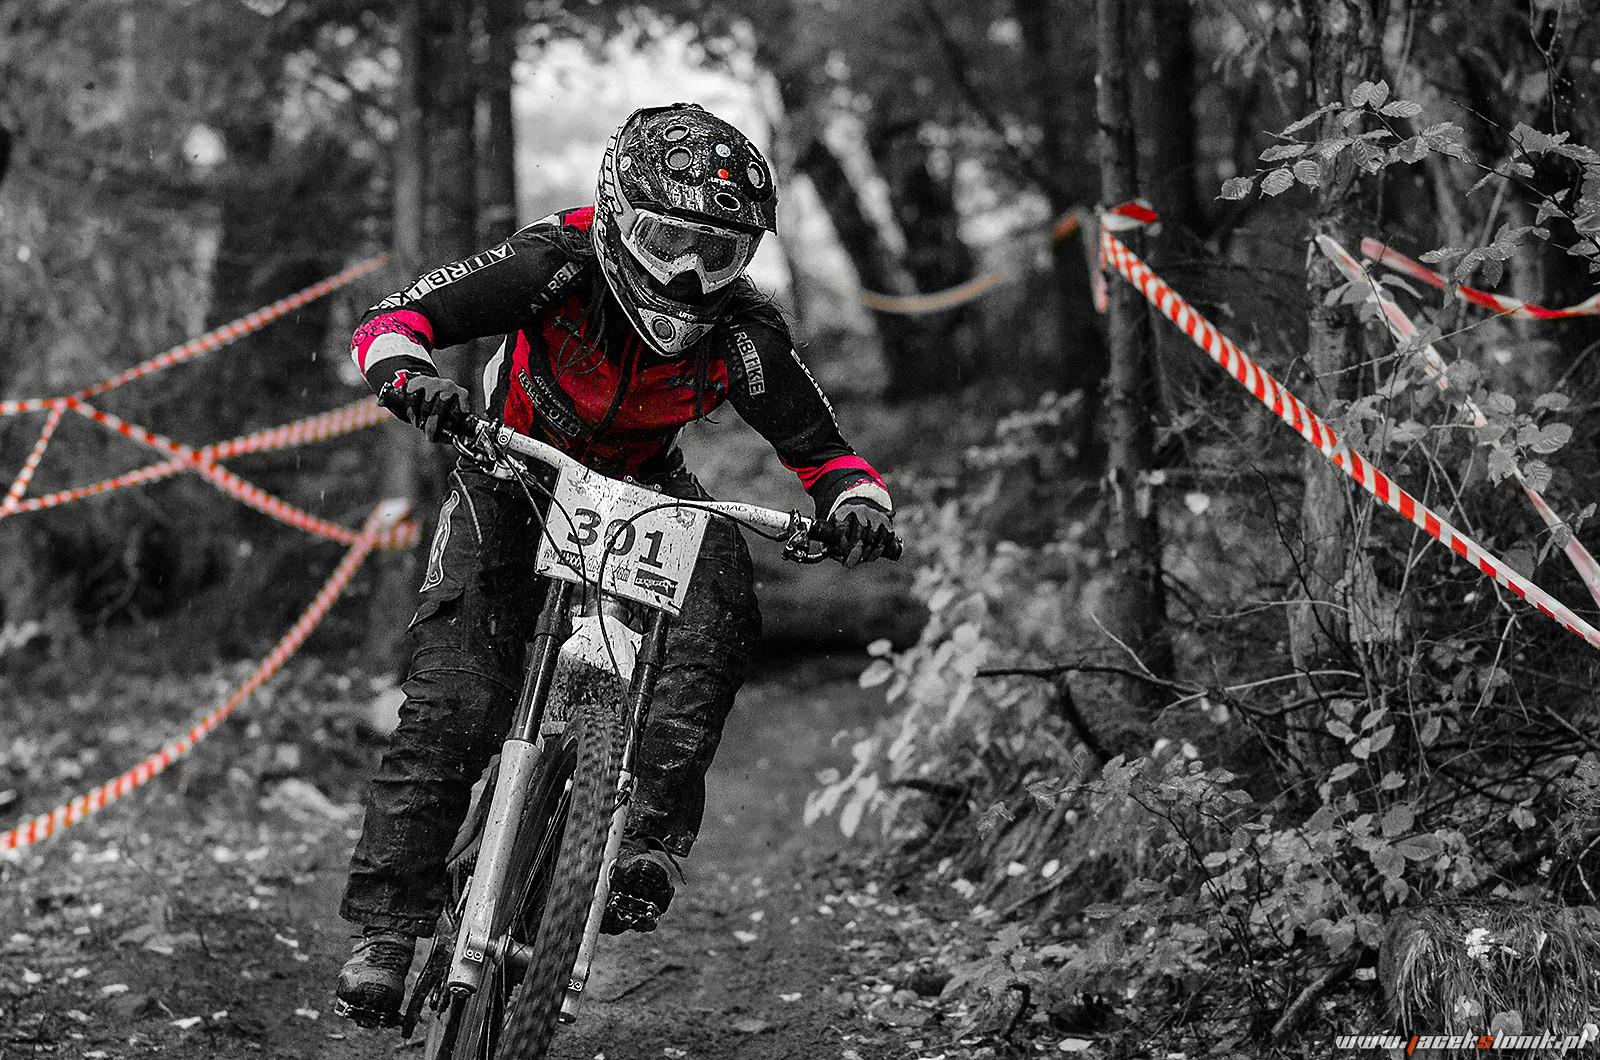 Ania Sojka - JacekSlonik - Mountain Biking Pictures - Vital MTB